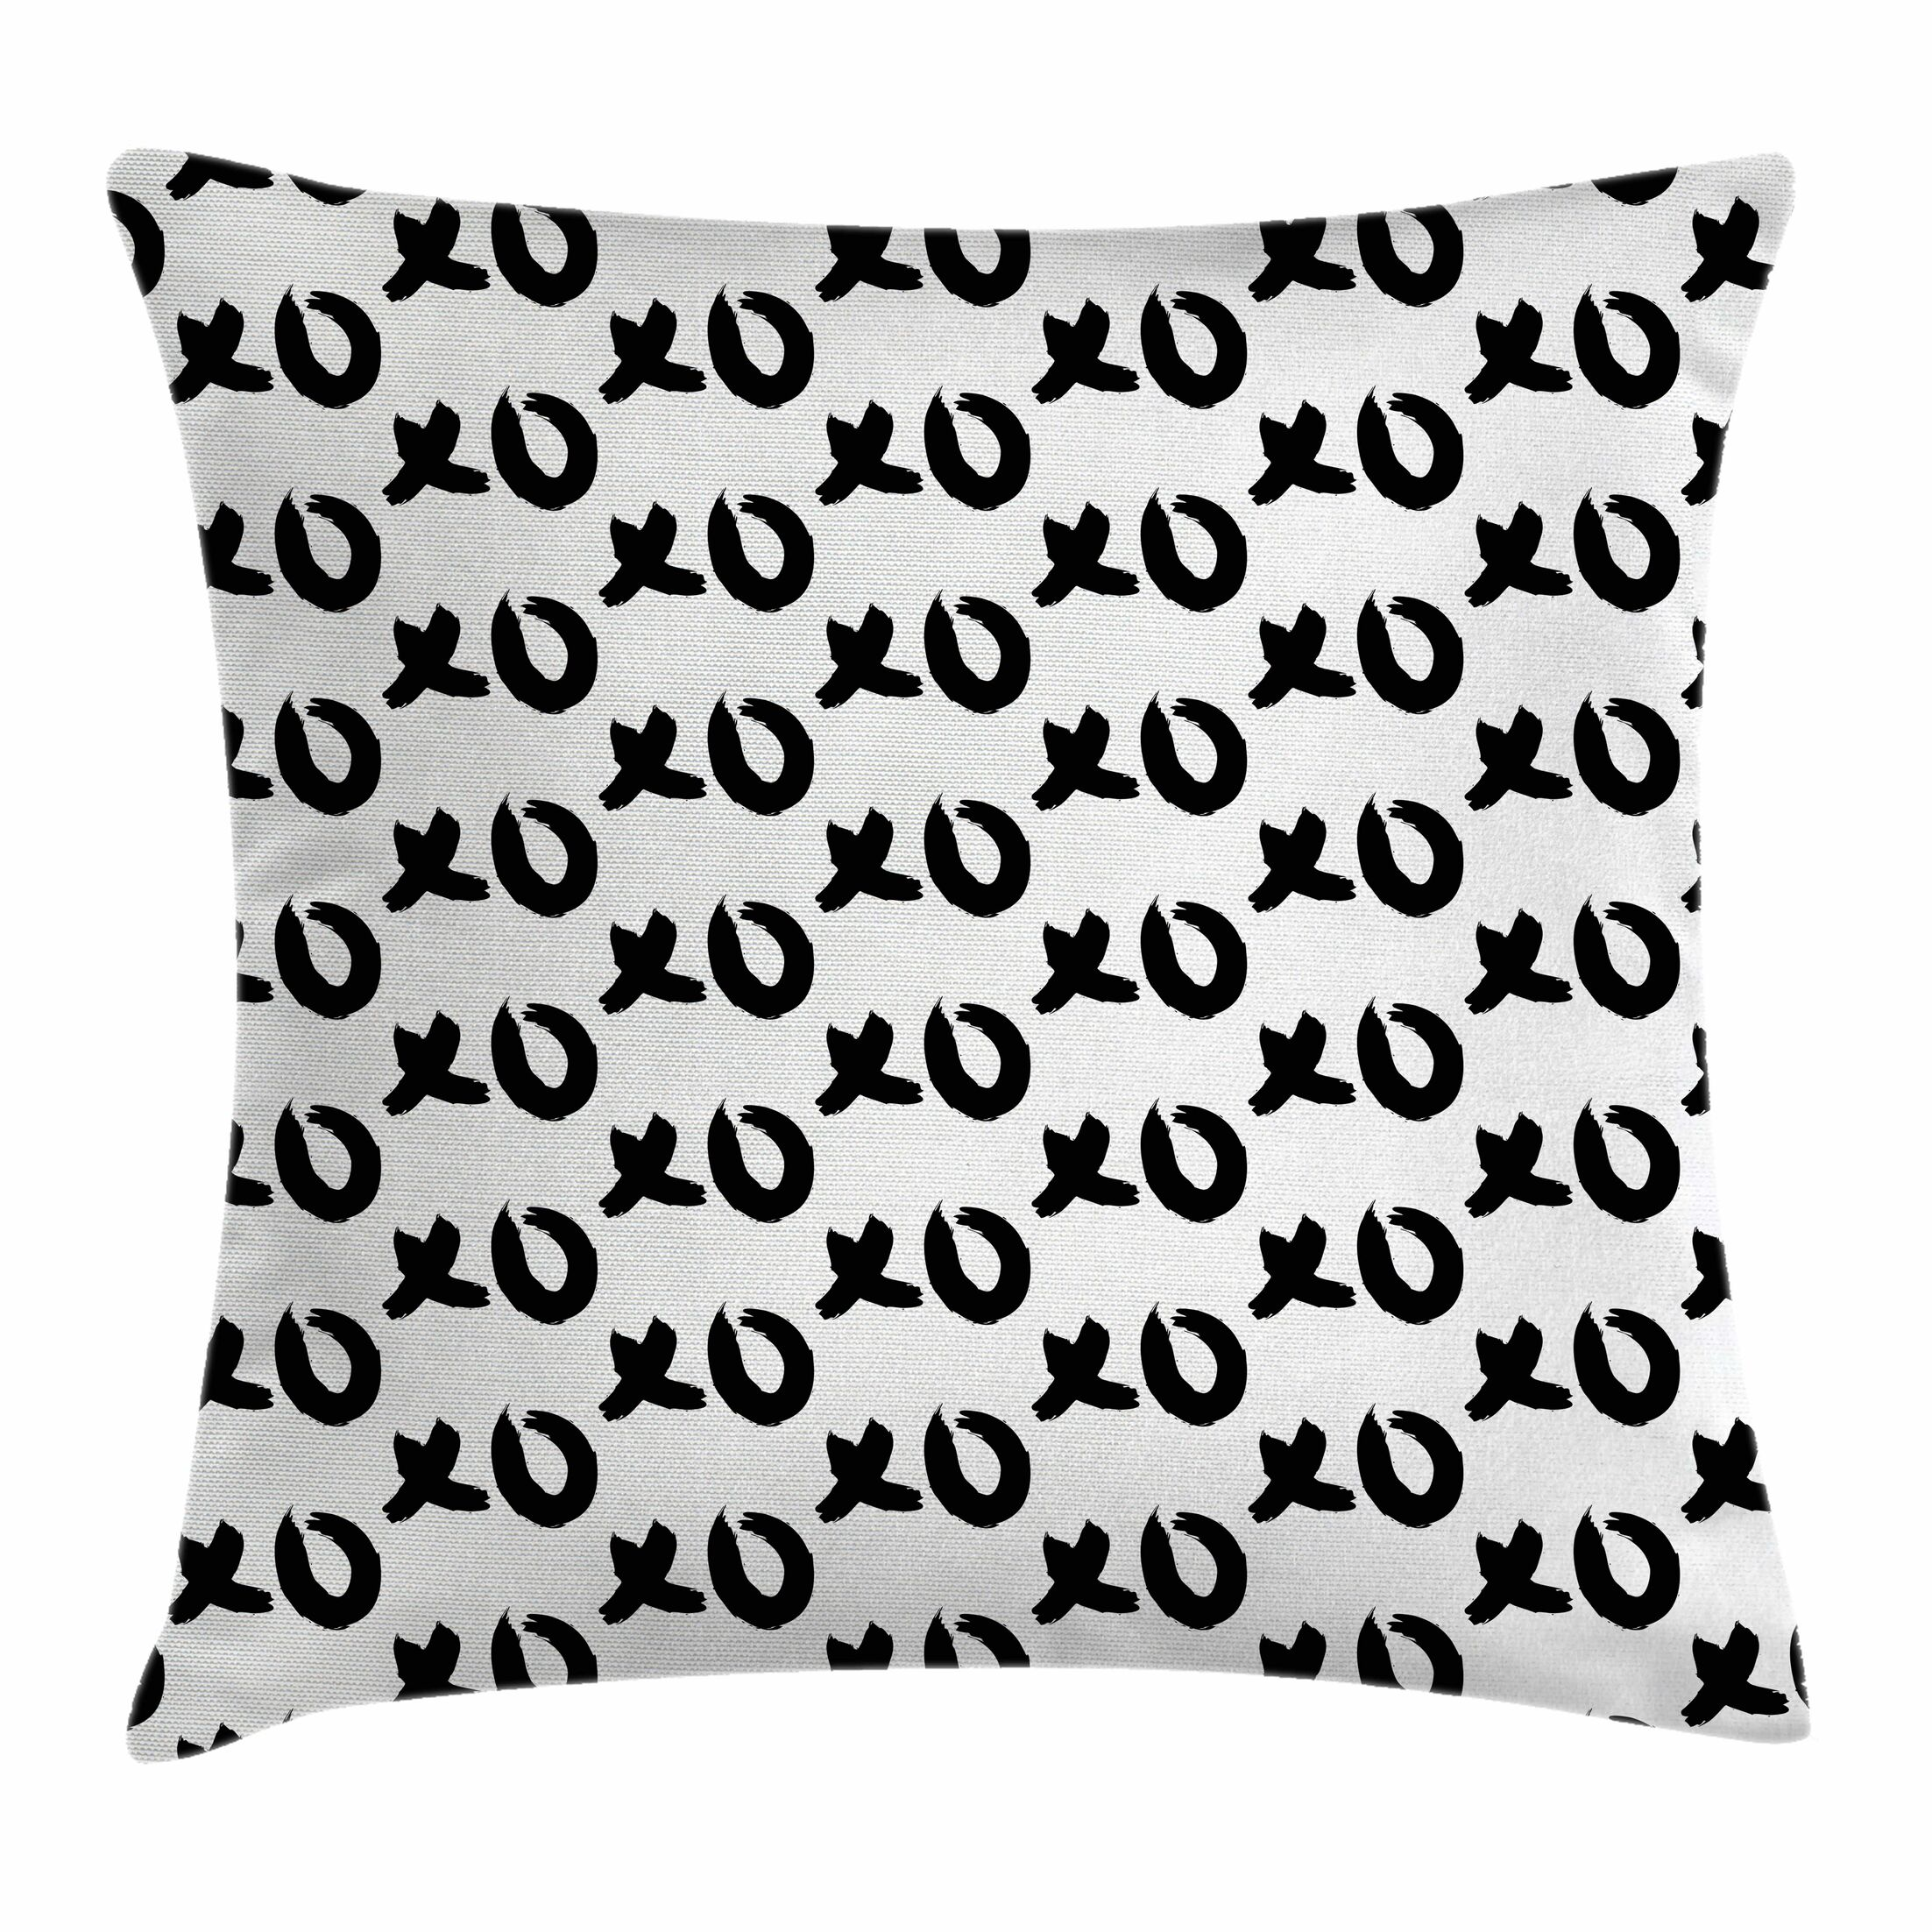 Xo Decor Paintbrush Words Art Square Pillow Cover Size: 24